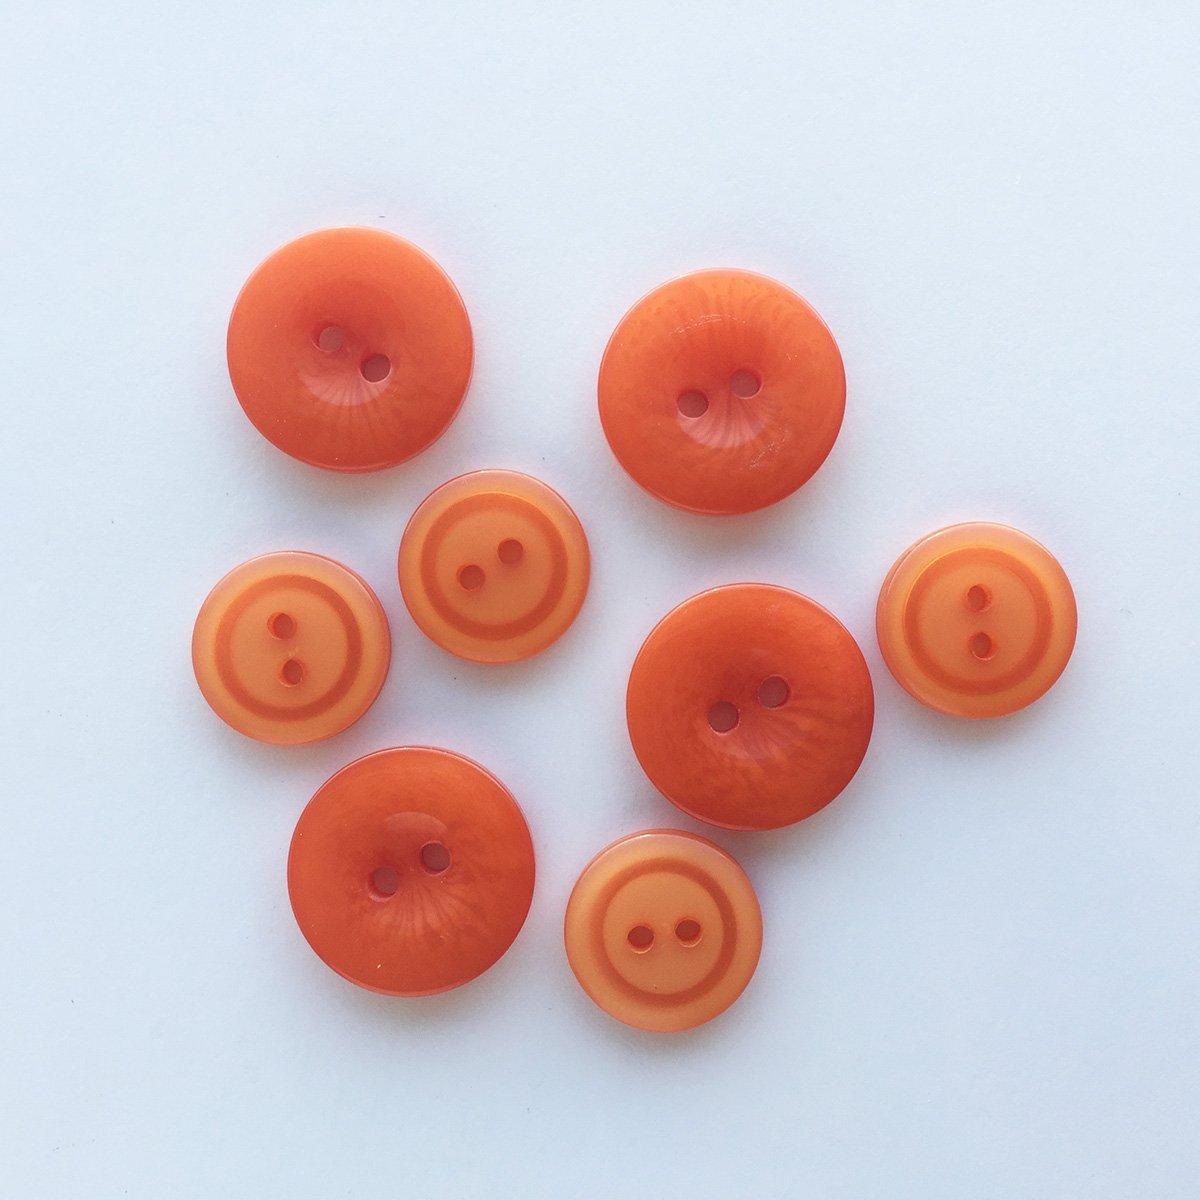 Button Up! Orange You Glad